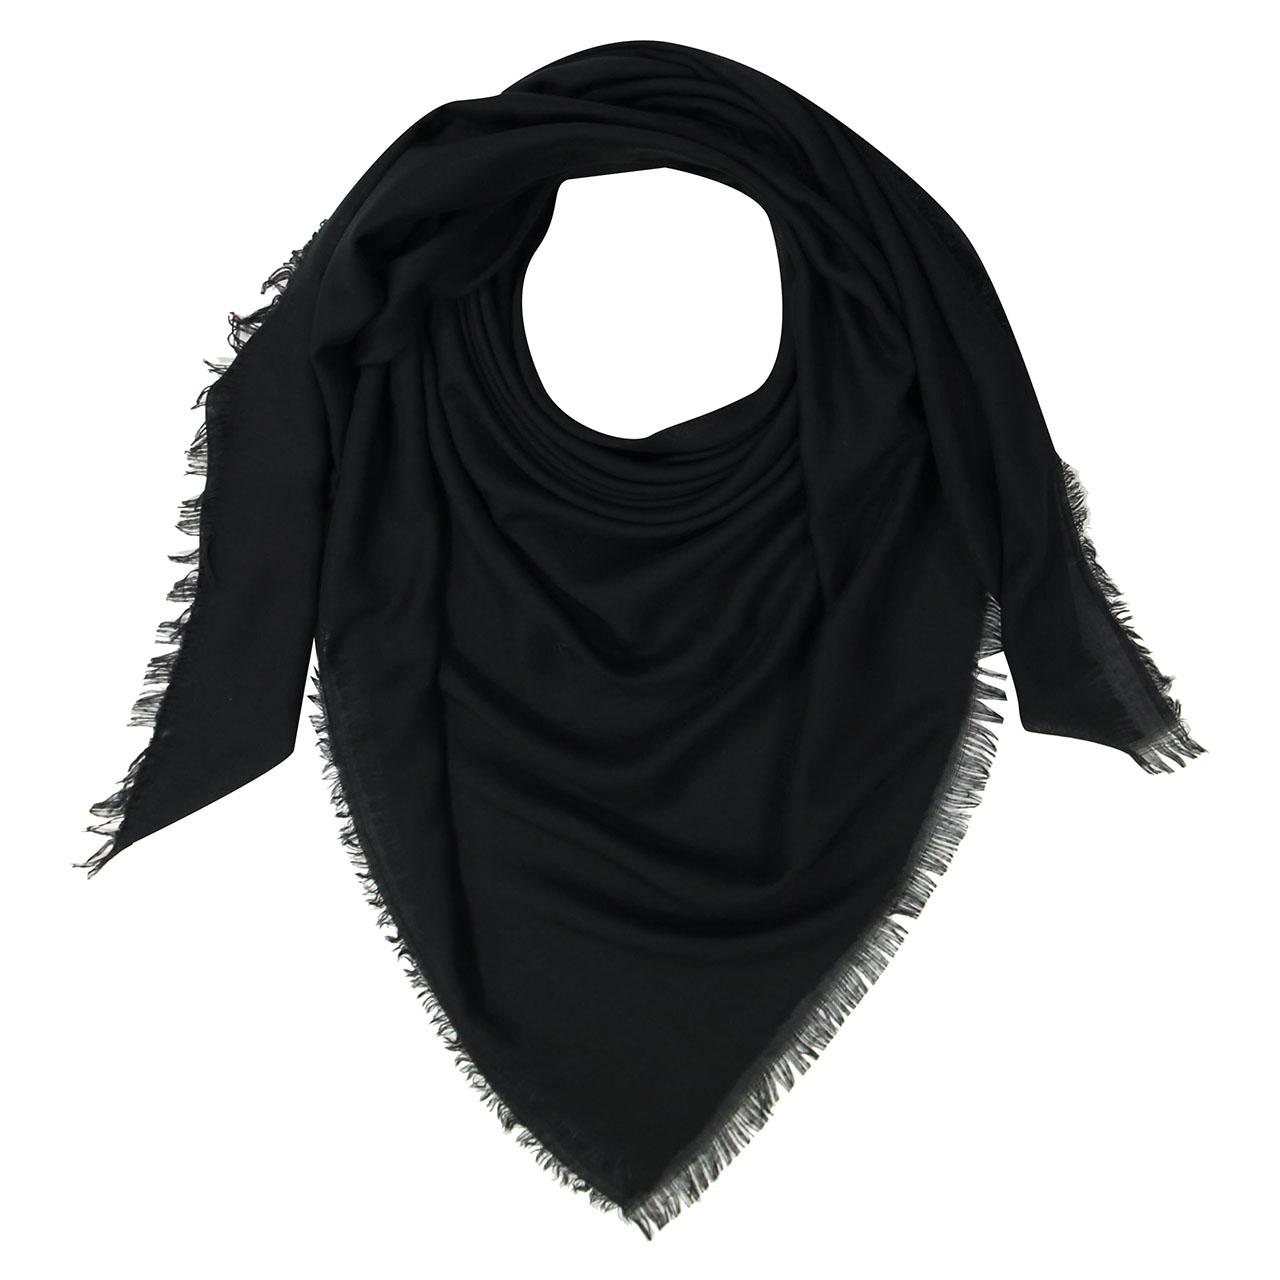 قیمت روسری زنانه مشکی کد 448